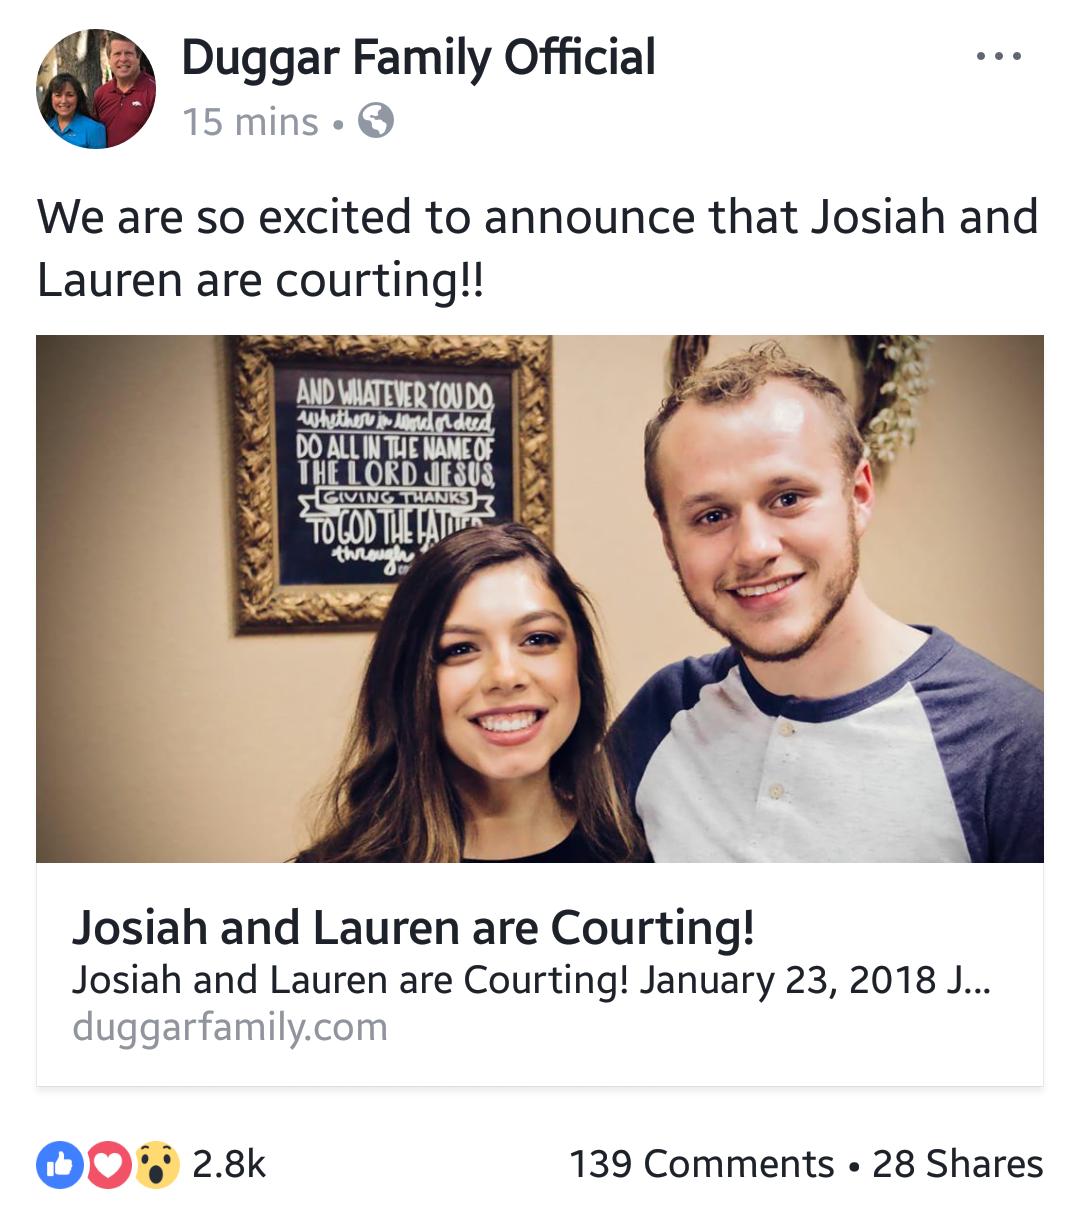 Duggar wedding 2018 images